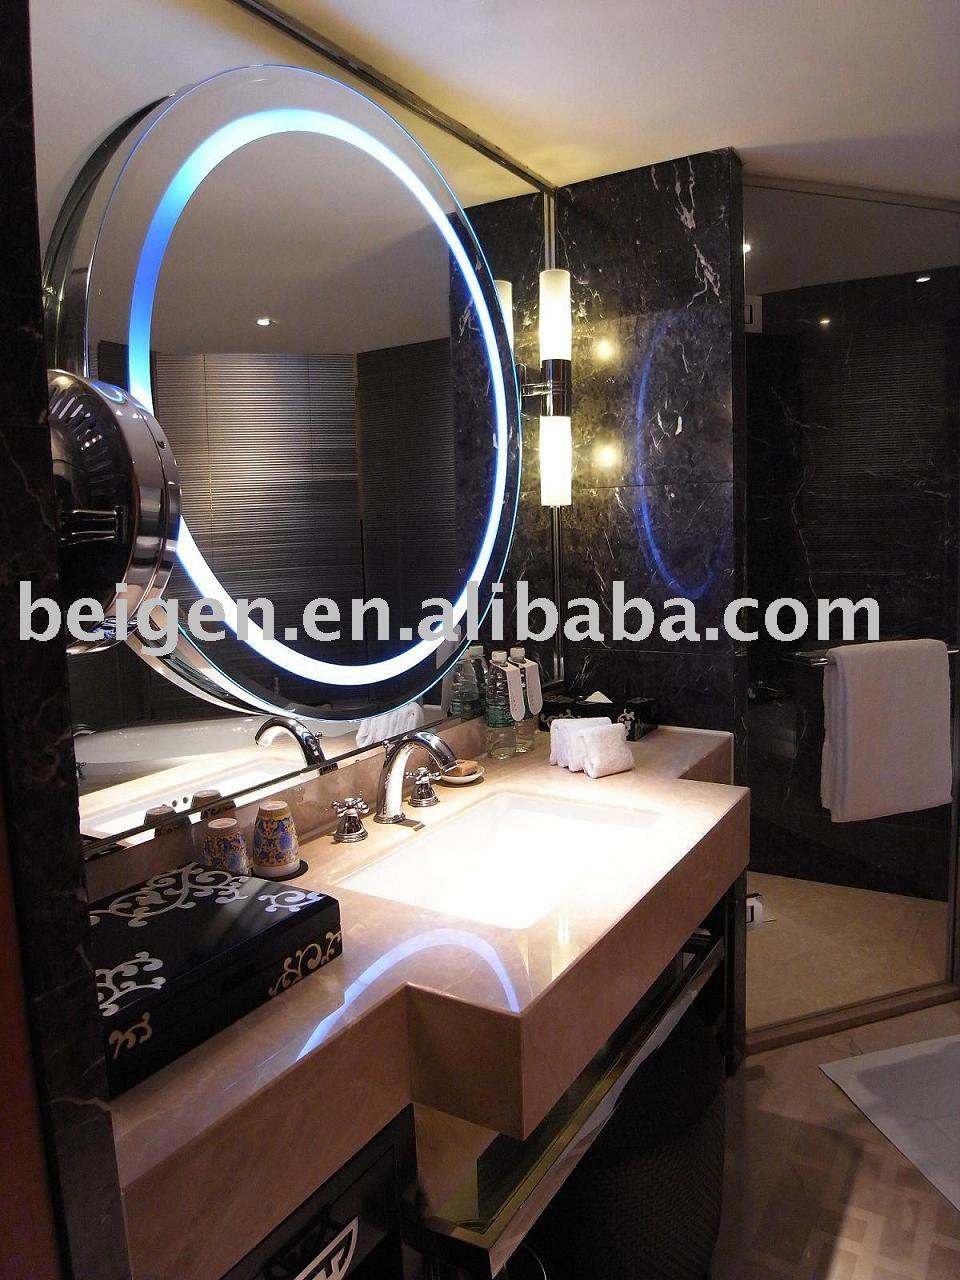 Bathroom Illuminated Mirror Hotel Bath